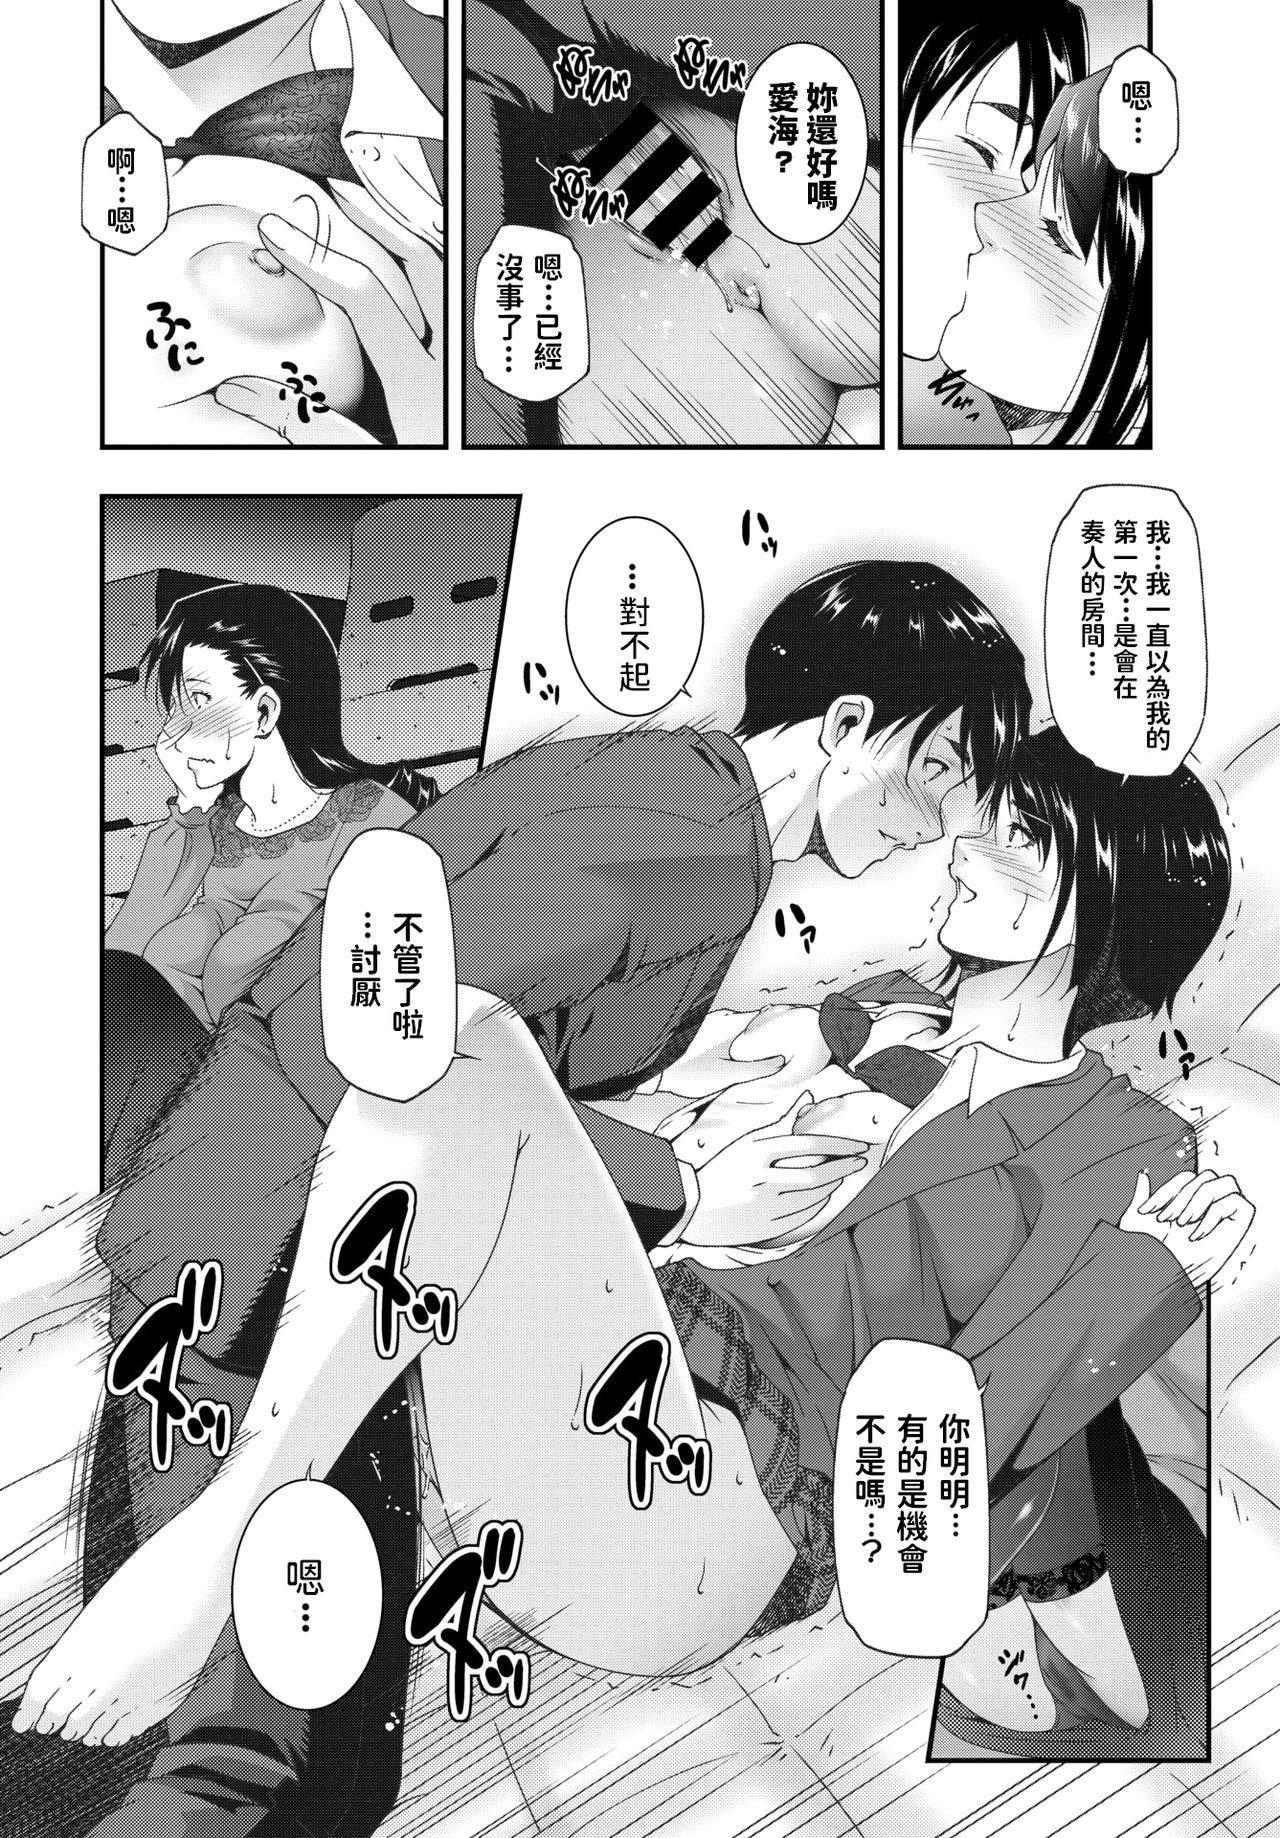 Cleansing Teacher 9